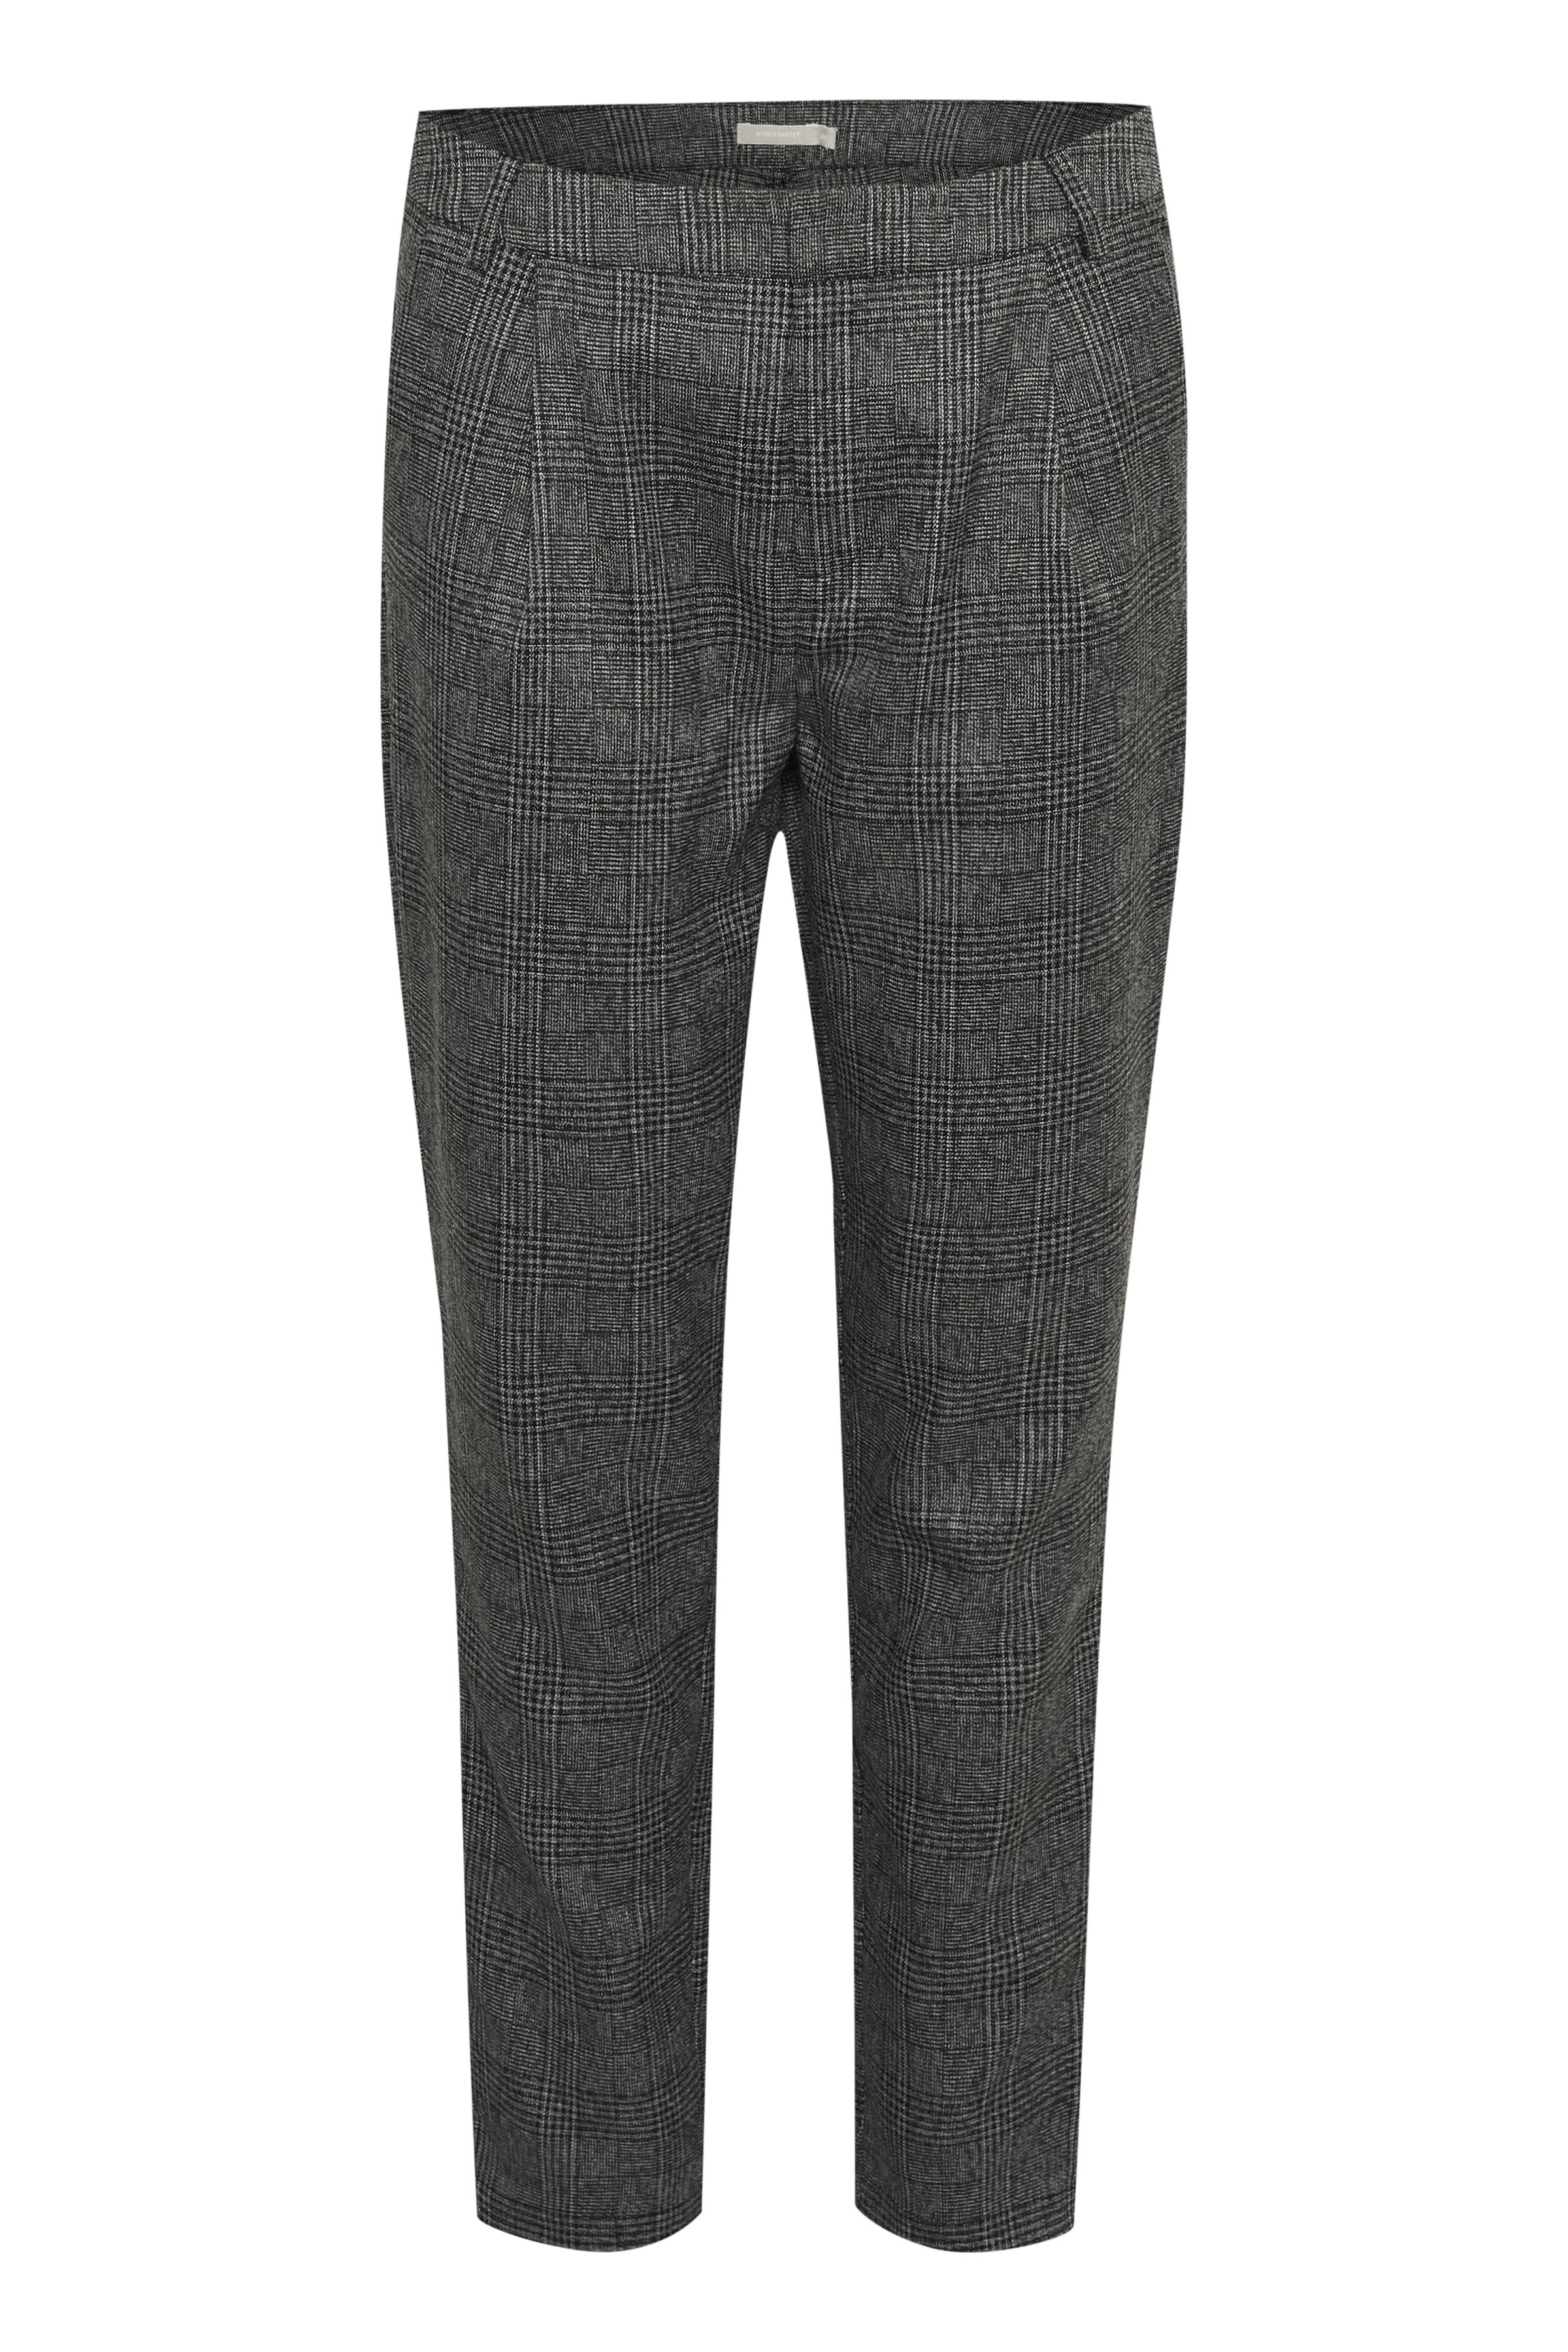 Image of BonA Parte Dame Imaan bukser med fast linning, bæltestropper og lynlås - Grå